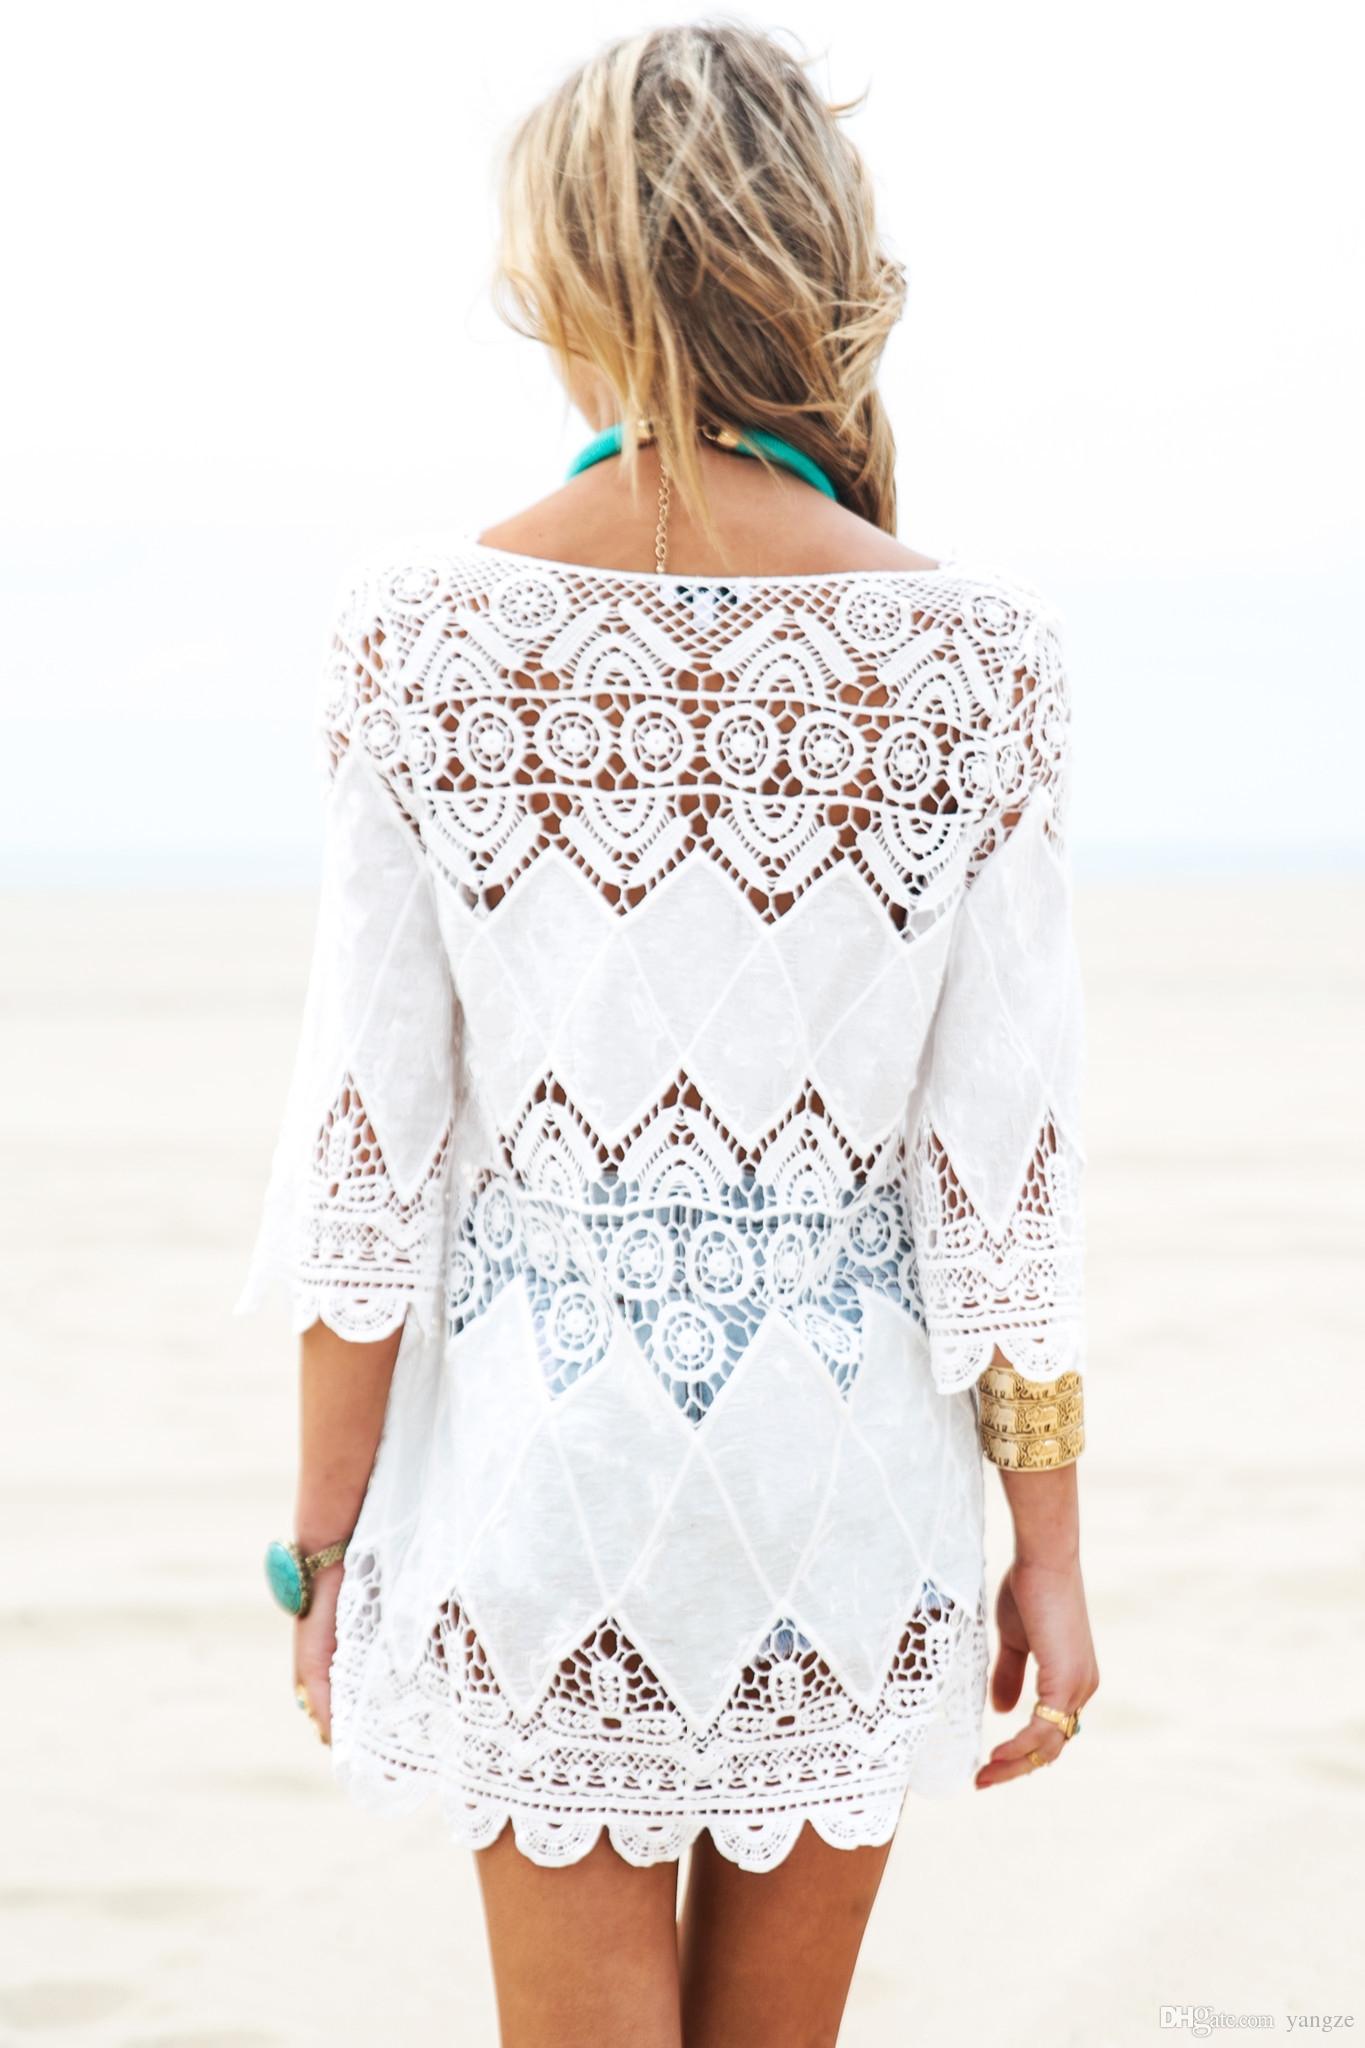 2017 Sexy Women Bikini Cover up Lace Wrap Beach Dress Boho Embroidery White Cover Up for Bikini Swimwear Beach dress Swimsuit Lady 908